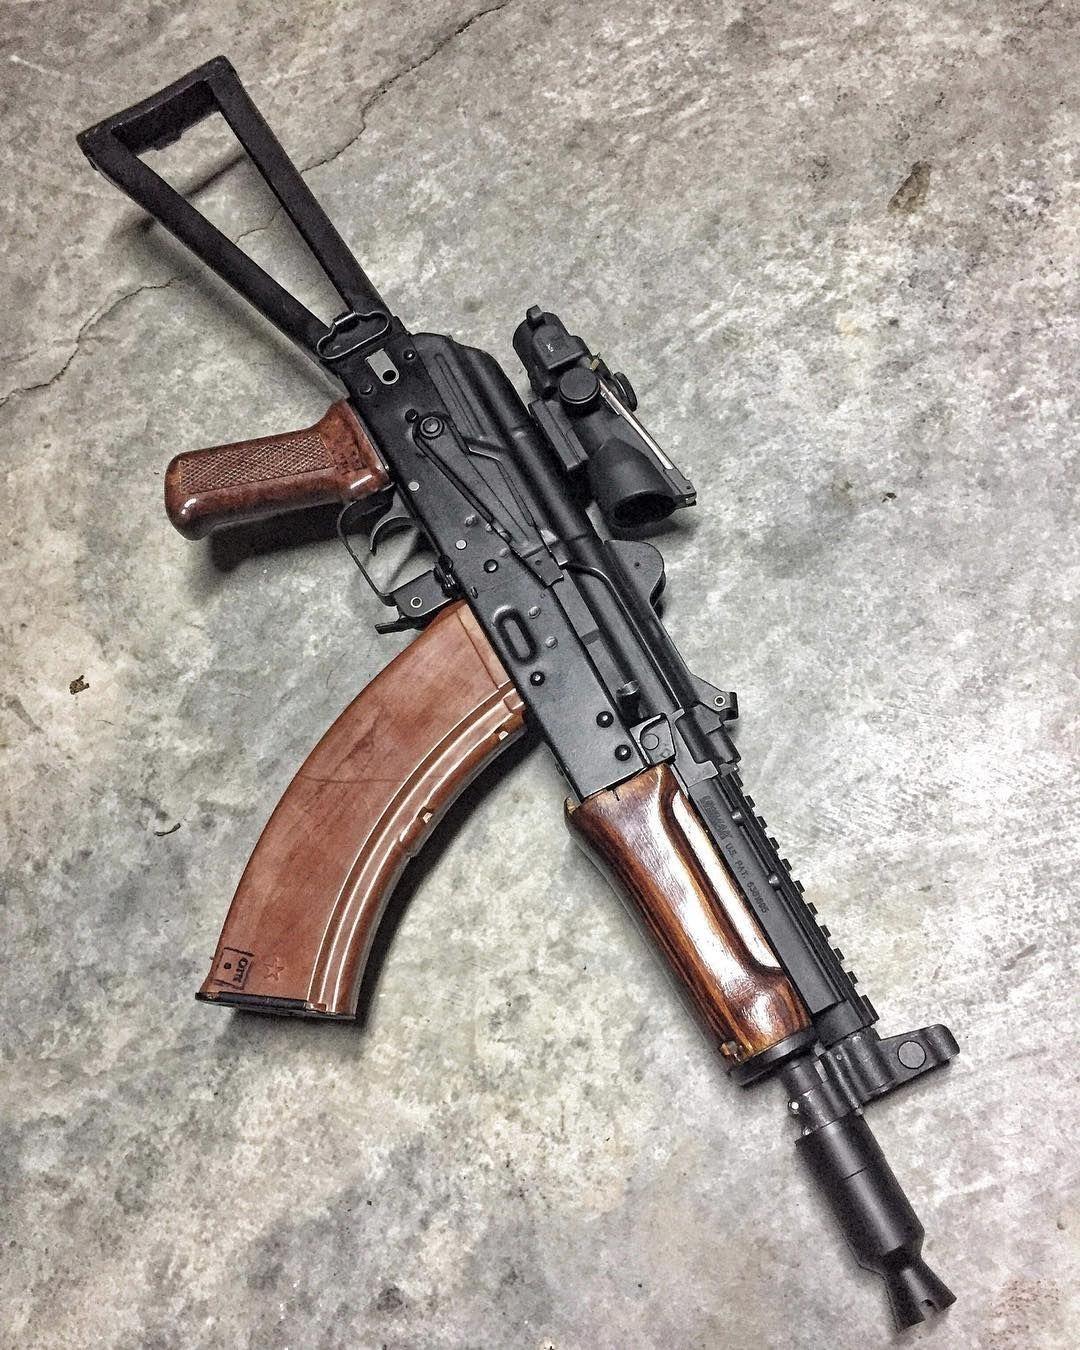 follow me @gunsrights #gunsrights #guncontrol #guns #gunlove #sam7k ...